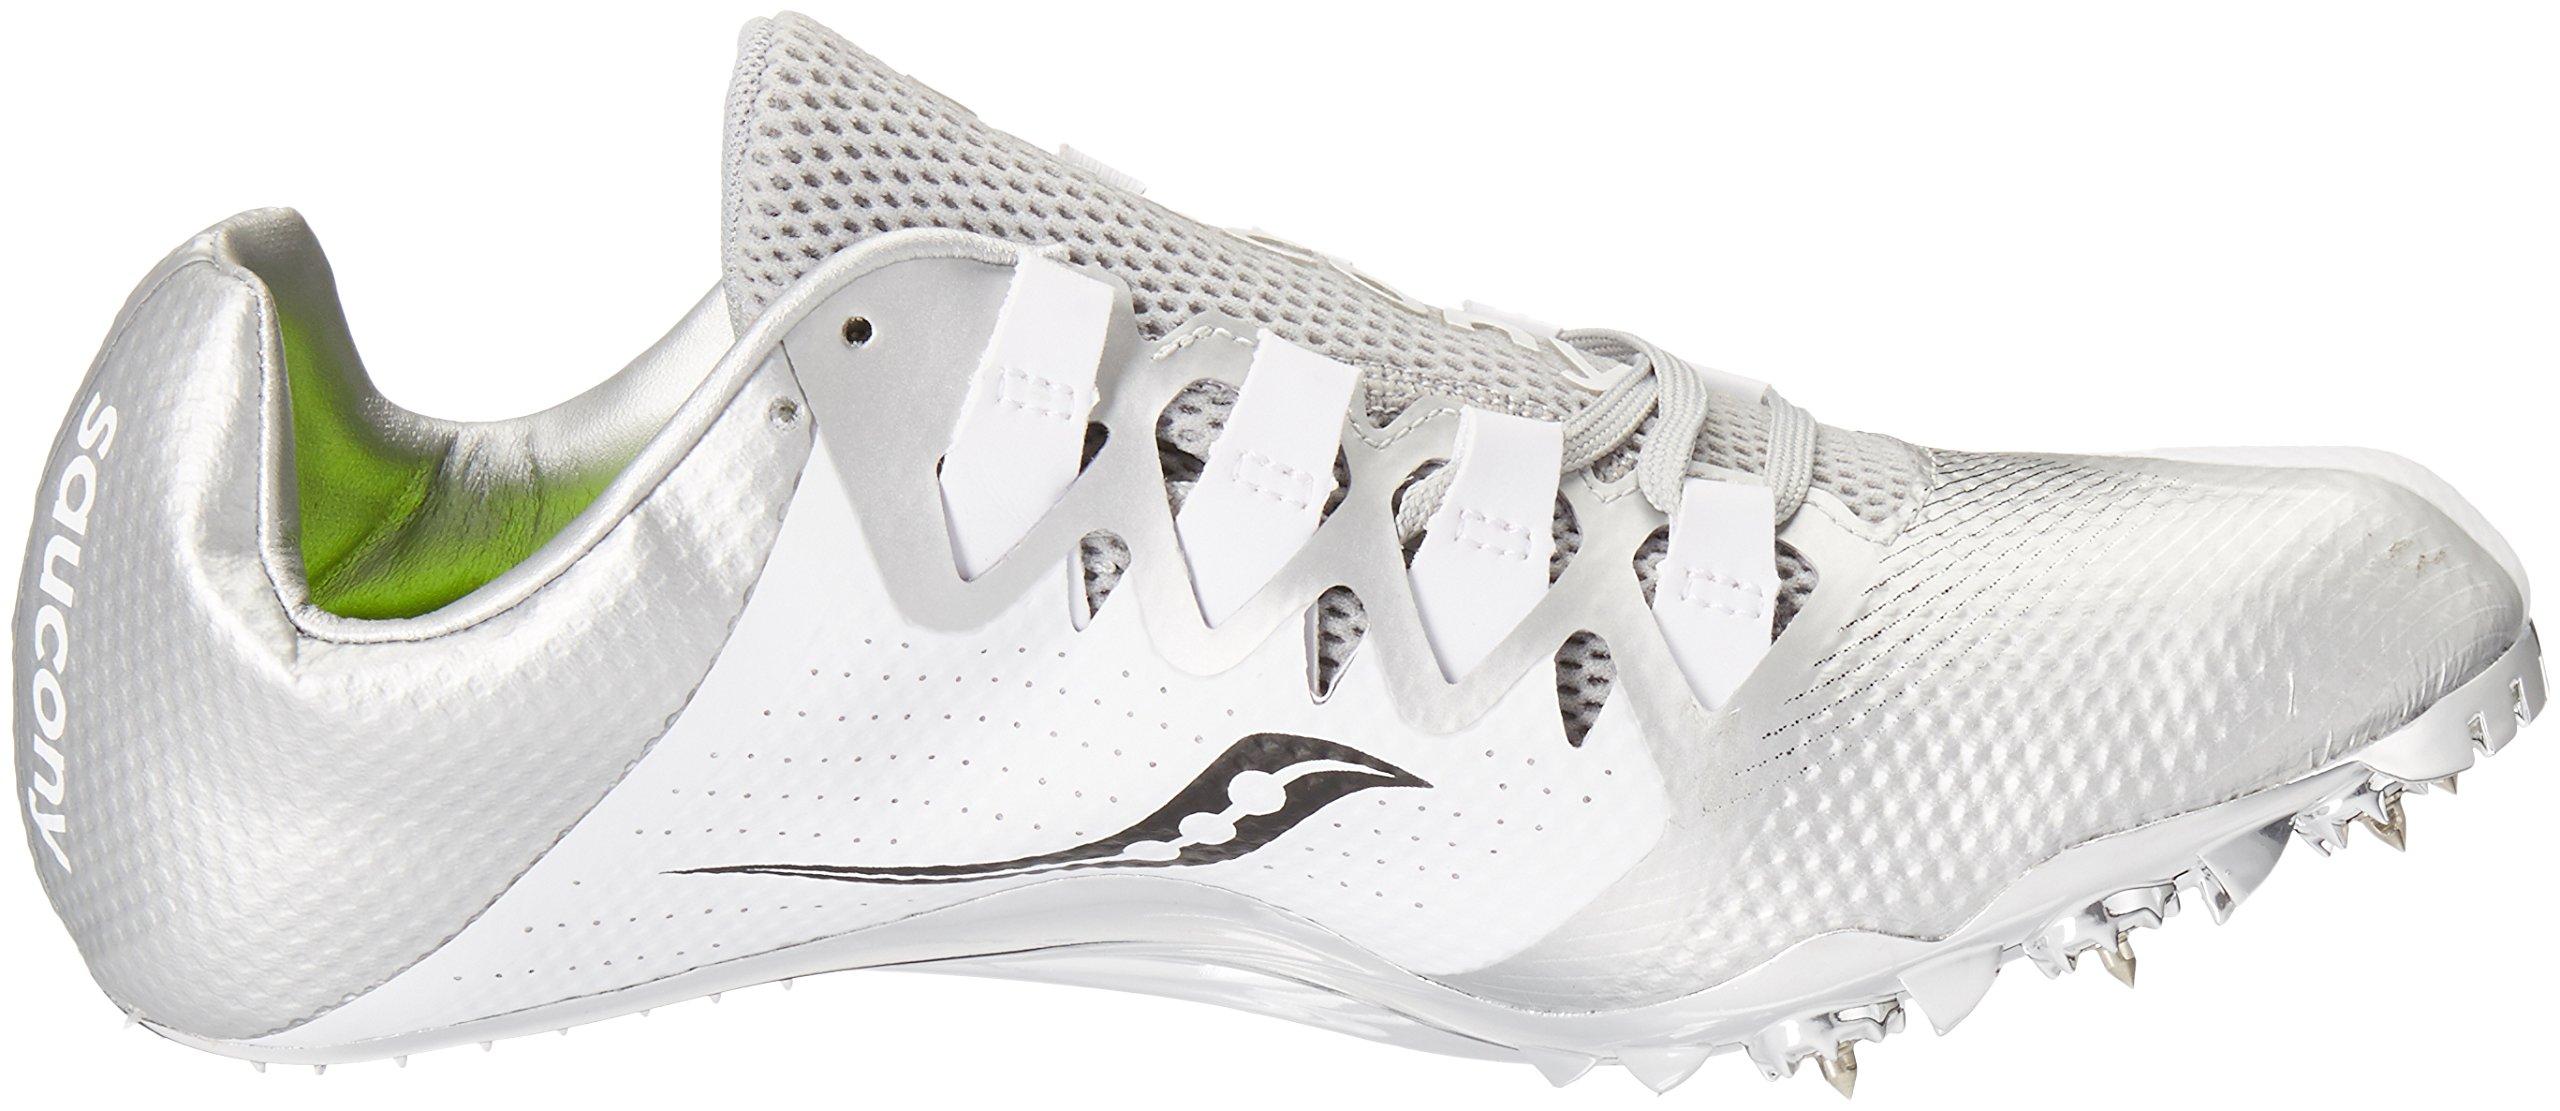 Saucony Women's Showdown 4 Track Shoe White/Silver 10 M US by Saucony (Image #7)